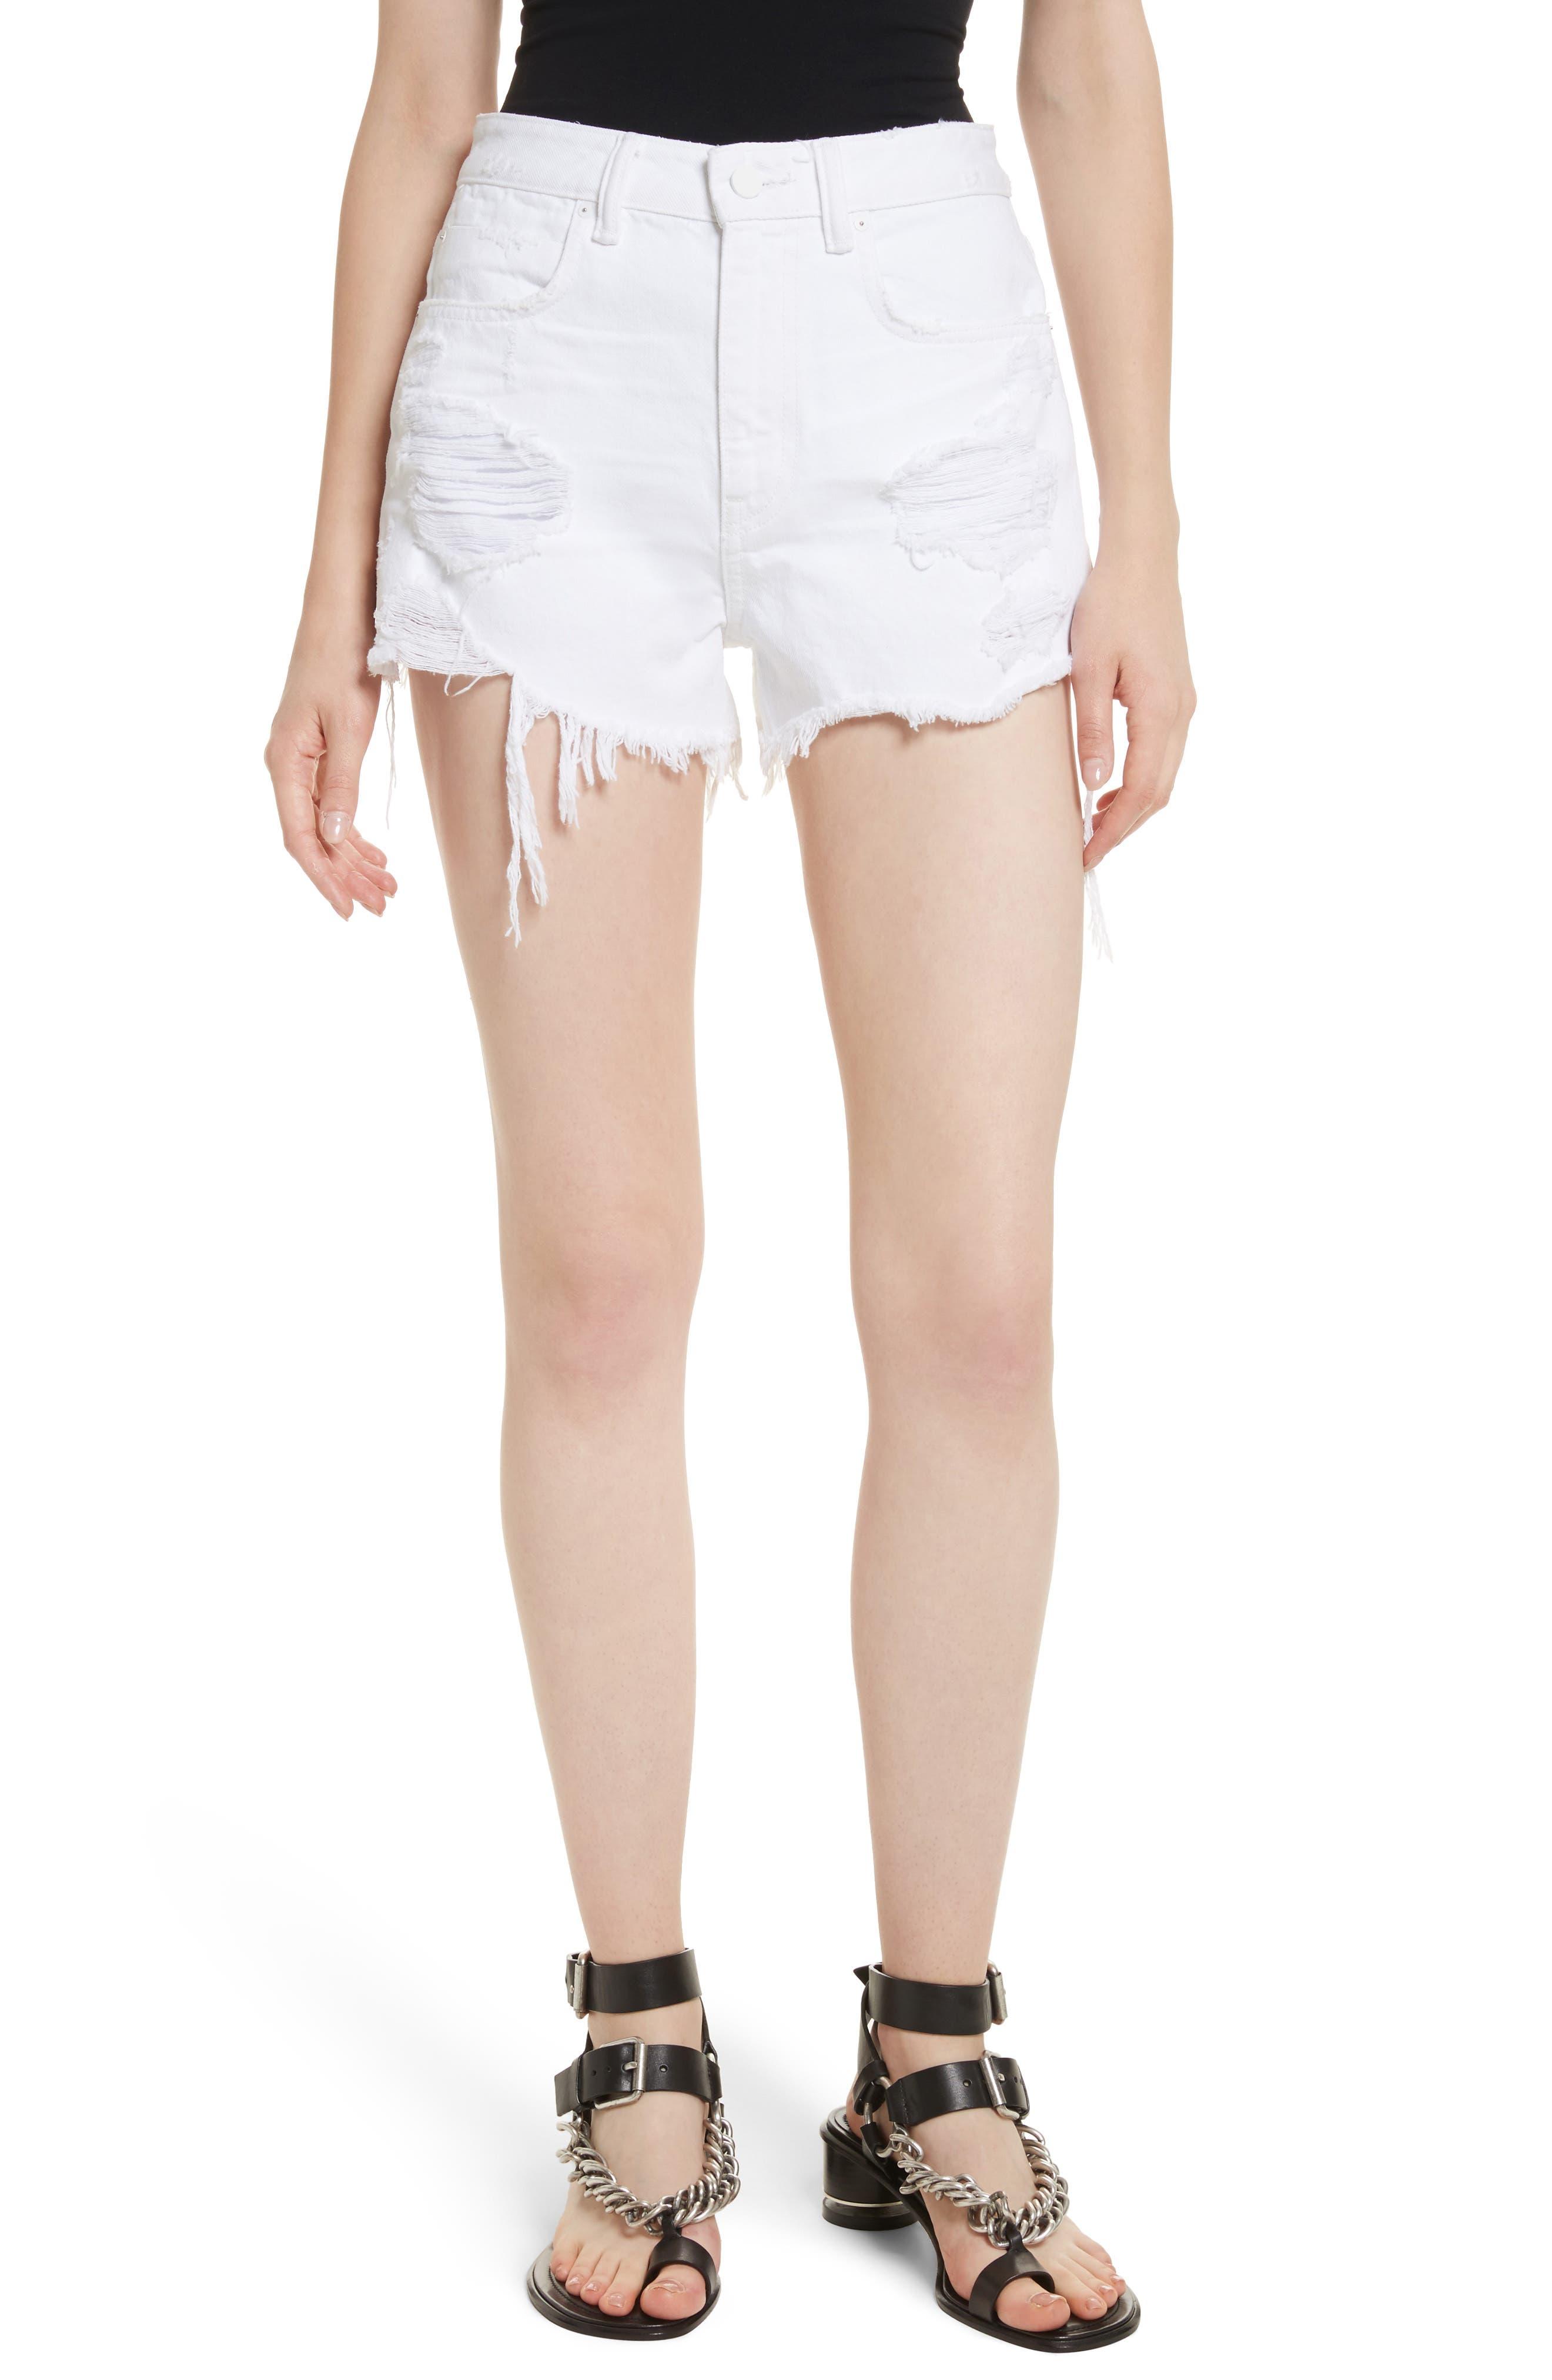 Bite White Ripped Denim Shorts,                             Main thumbnail 1, color,                             Bleached Destroy